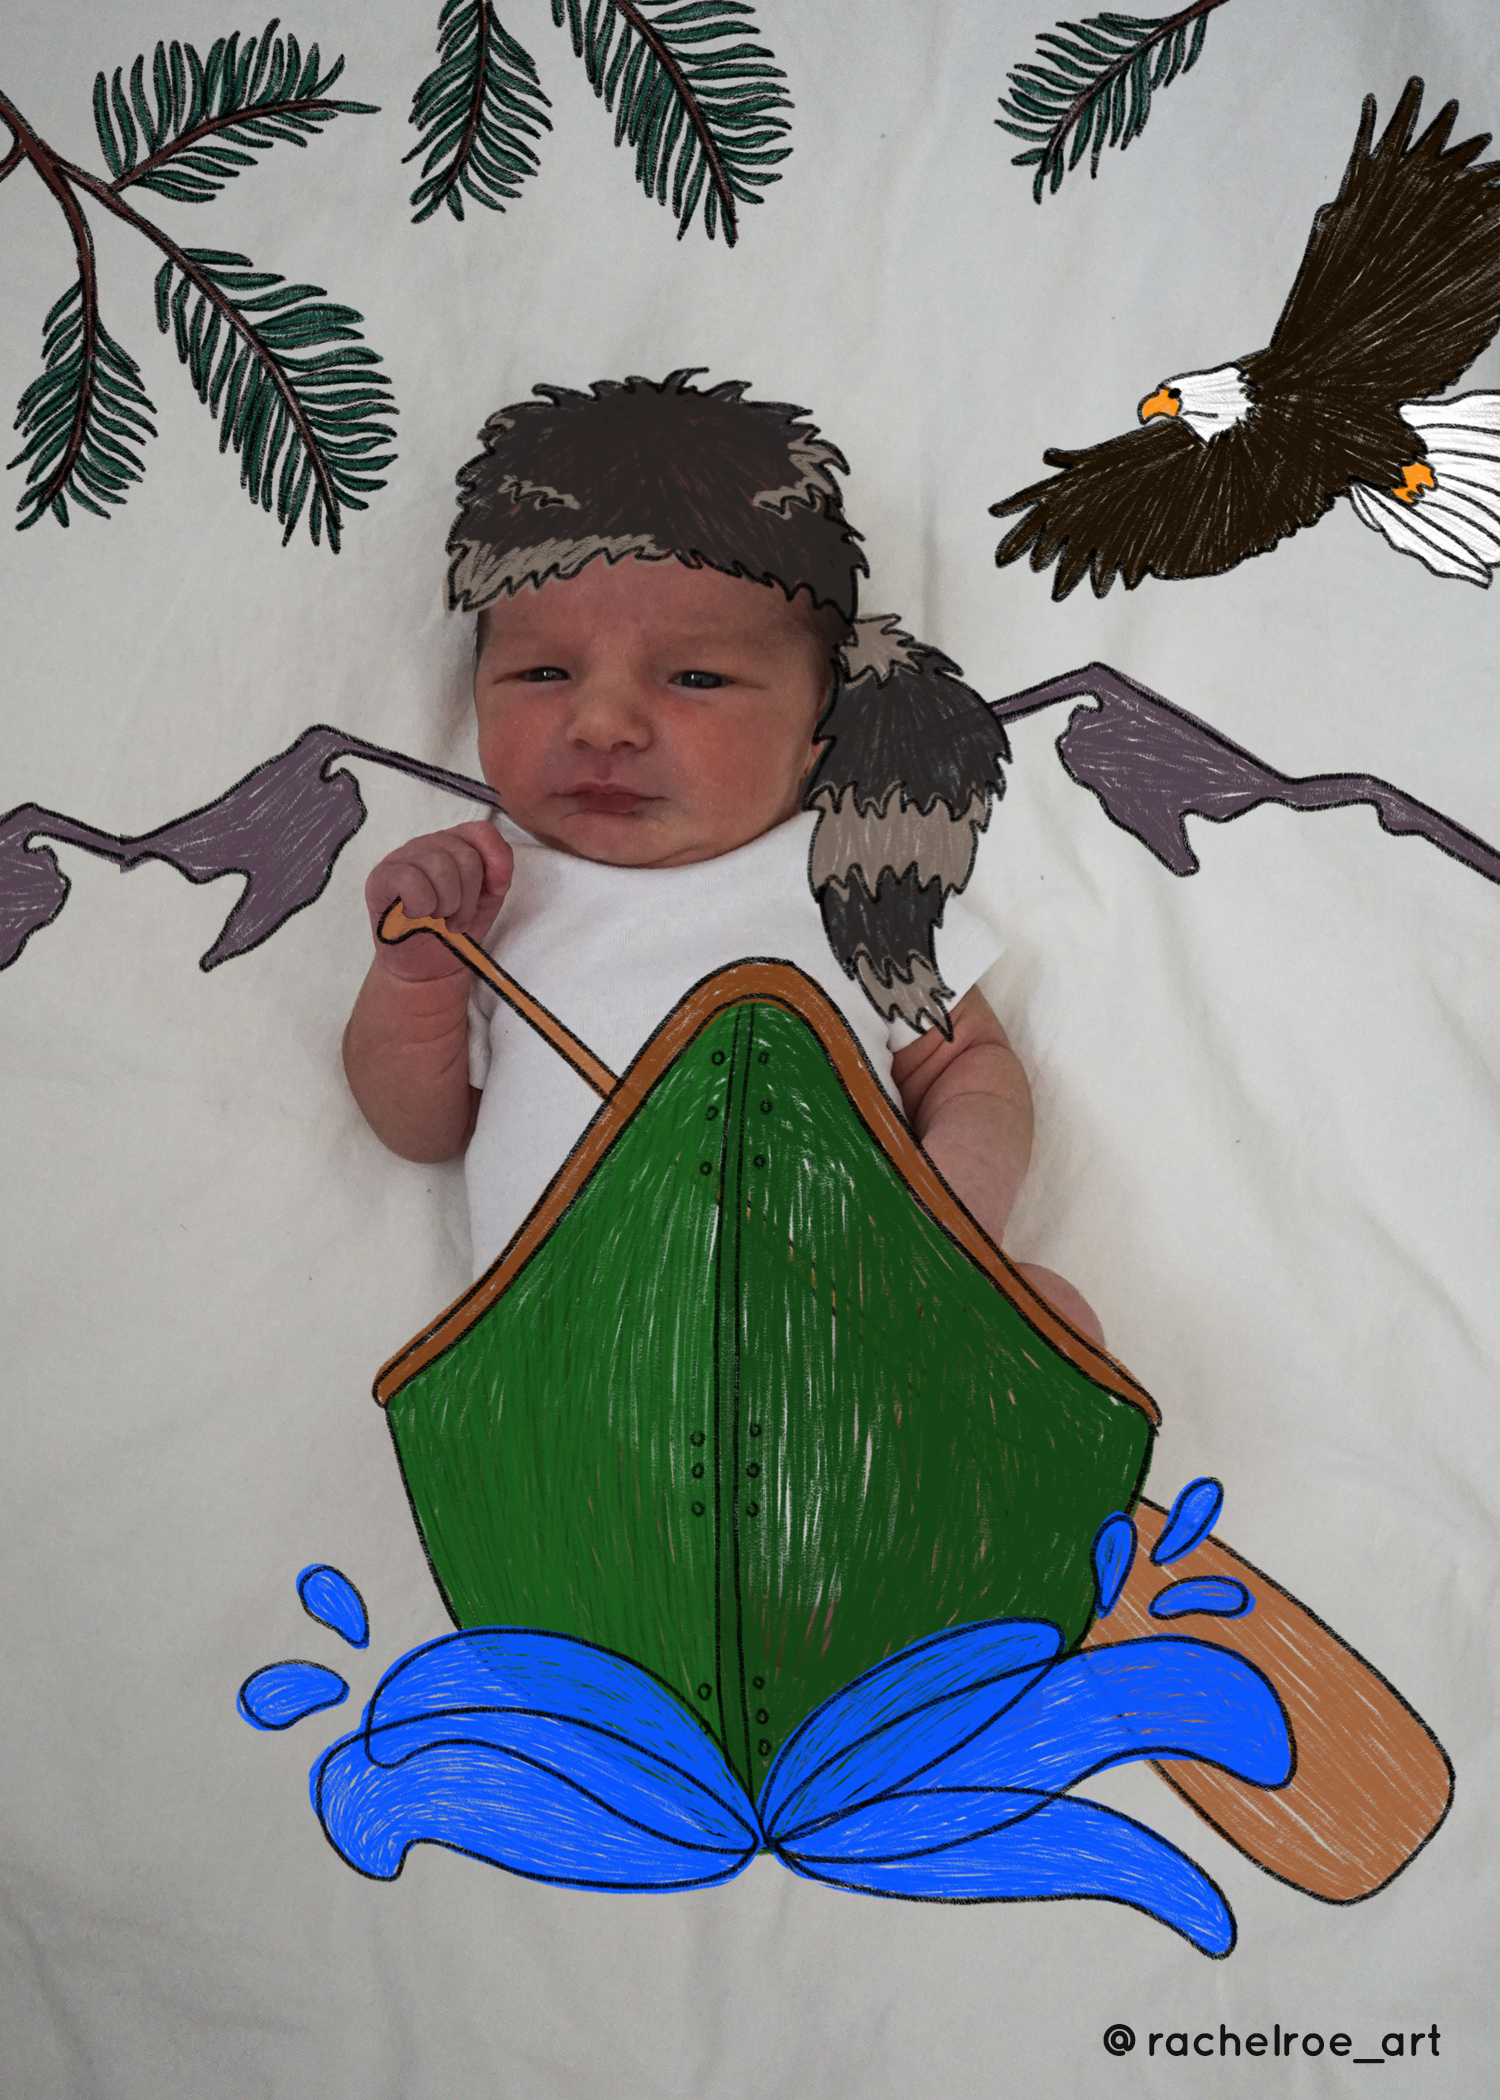 Baby Announcement Illustration_Canoe_Rachel Roe.jpg